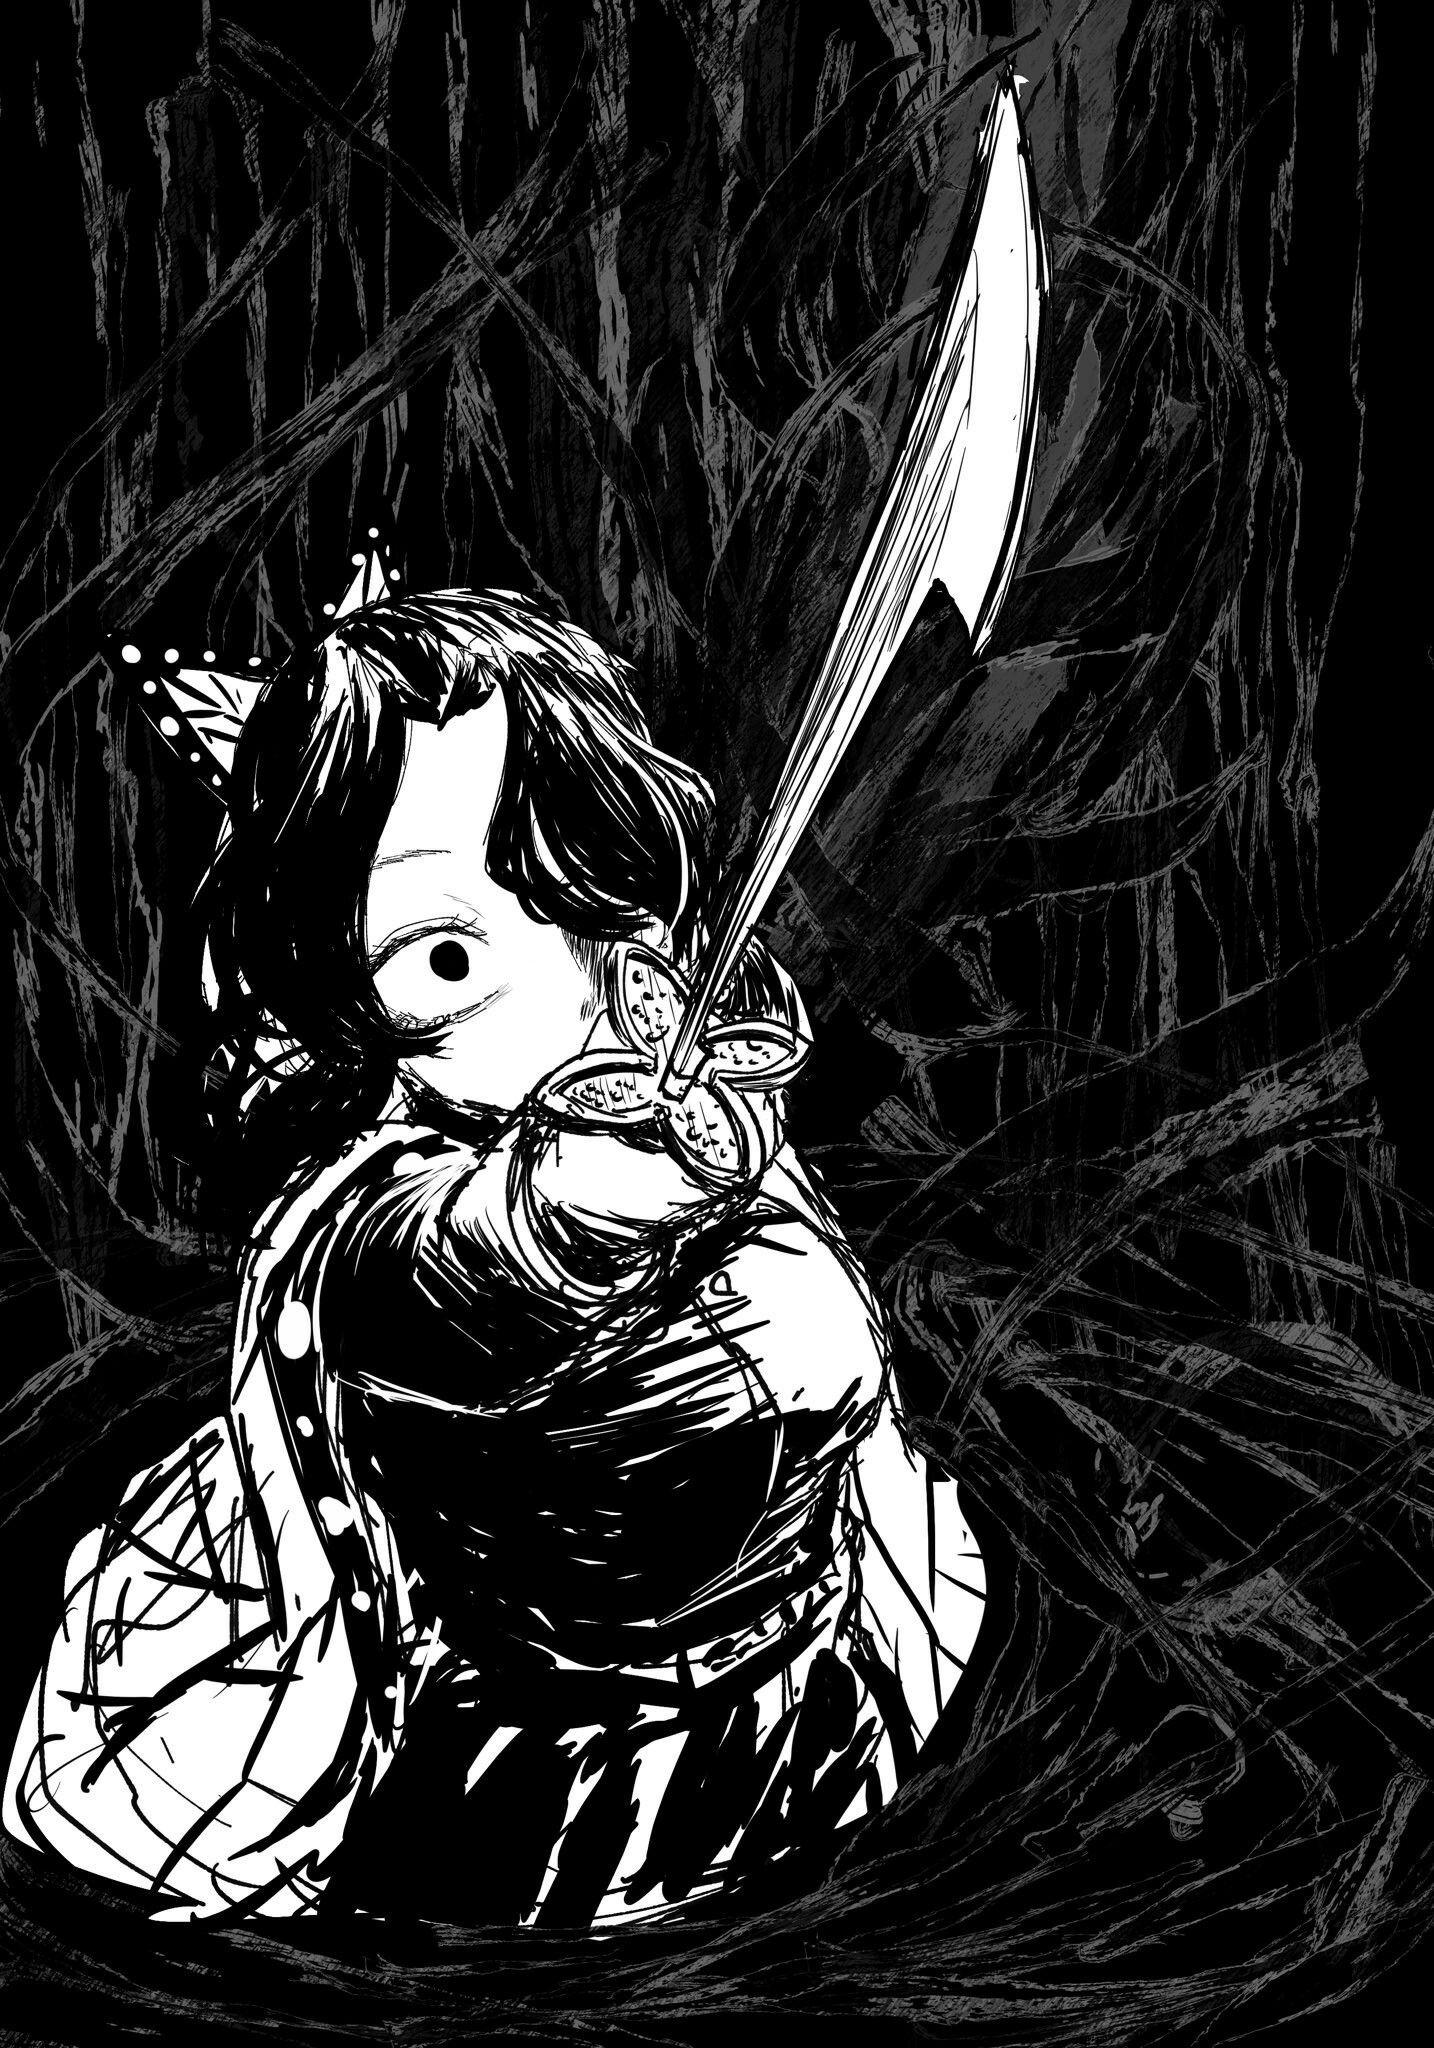 kochou shinobu キャラクターデザイン, しのぶ イラスト, イラスト